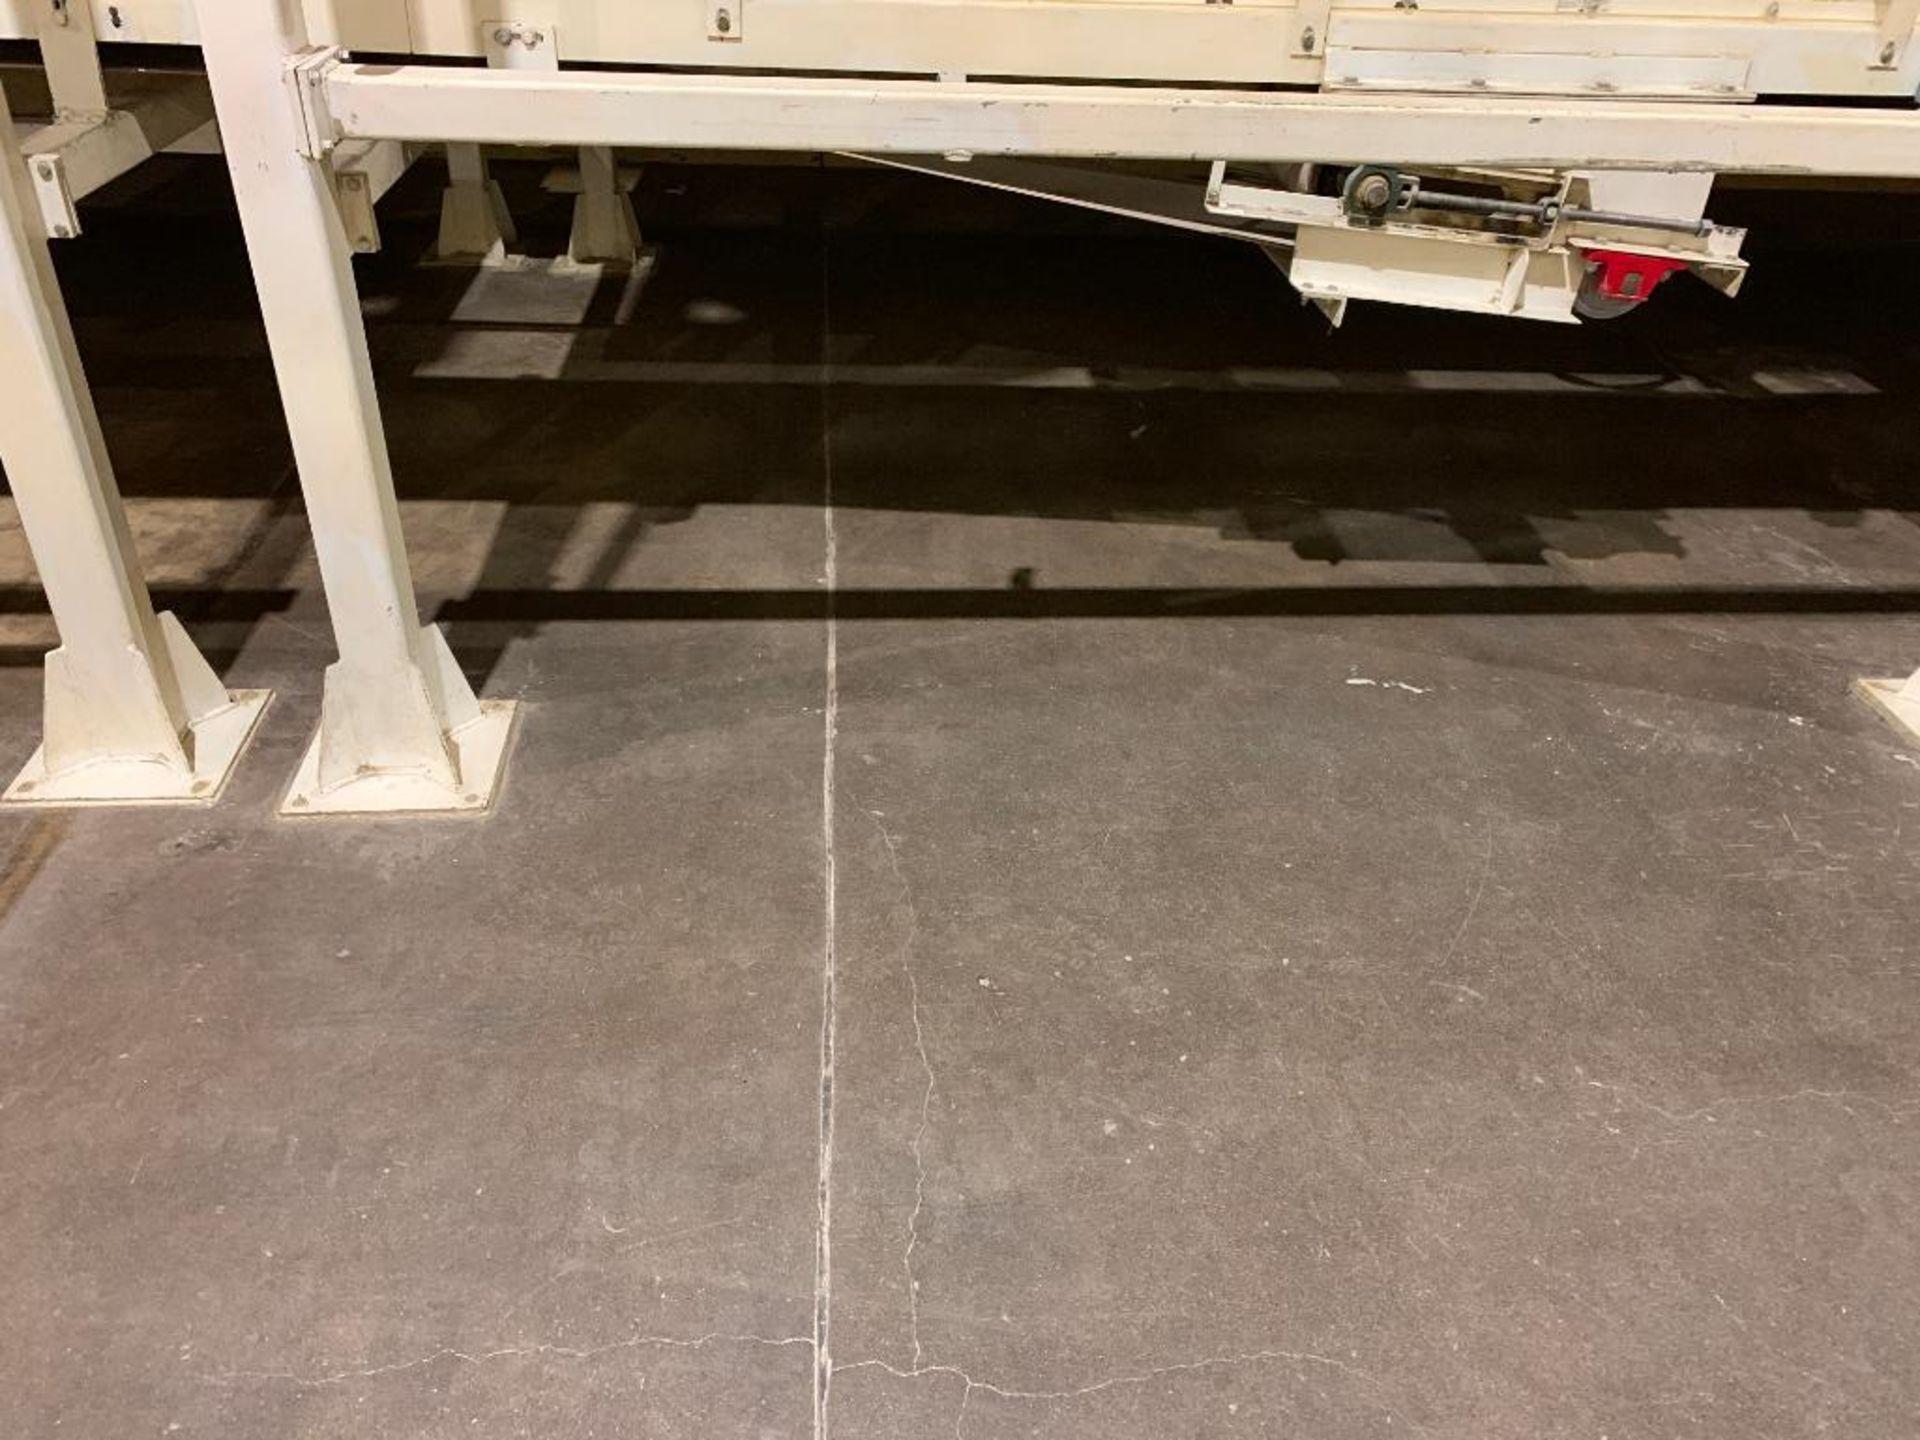 Aseeco mild steel cone bottom bulk storage bin - Image 3 of 22